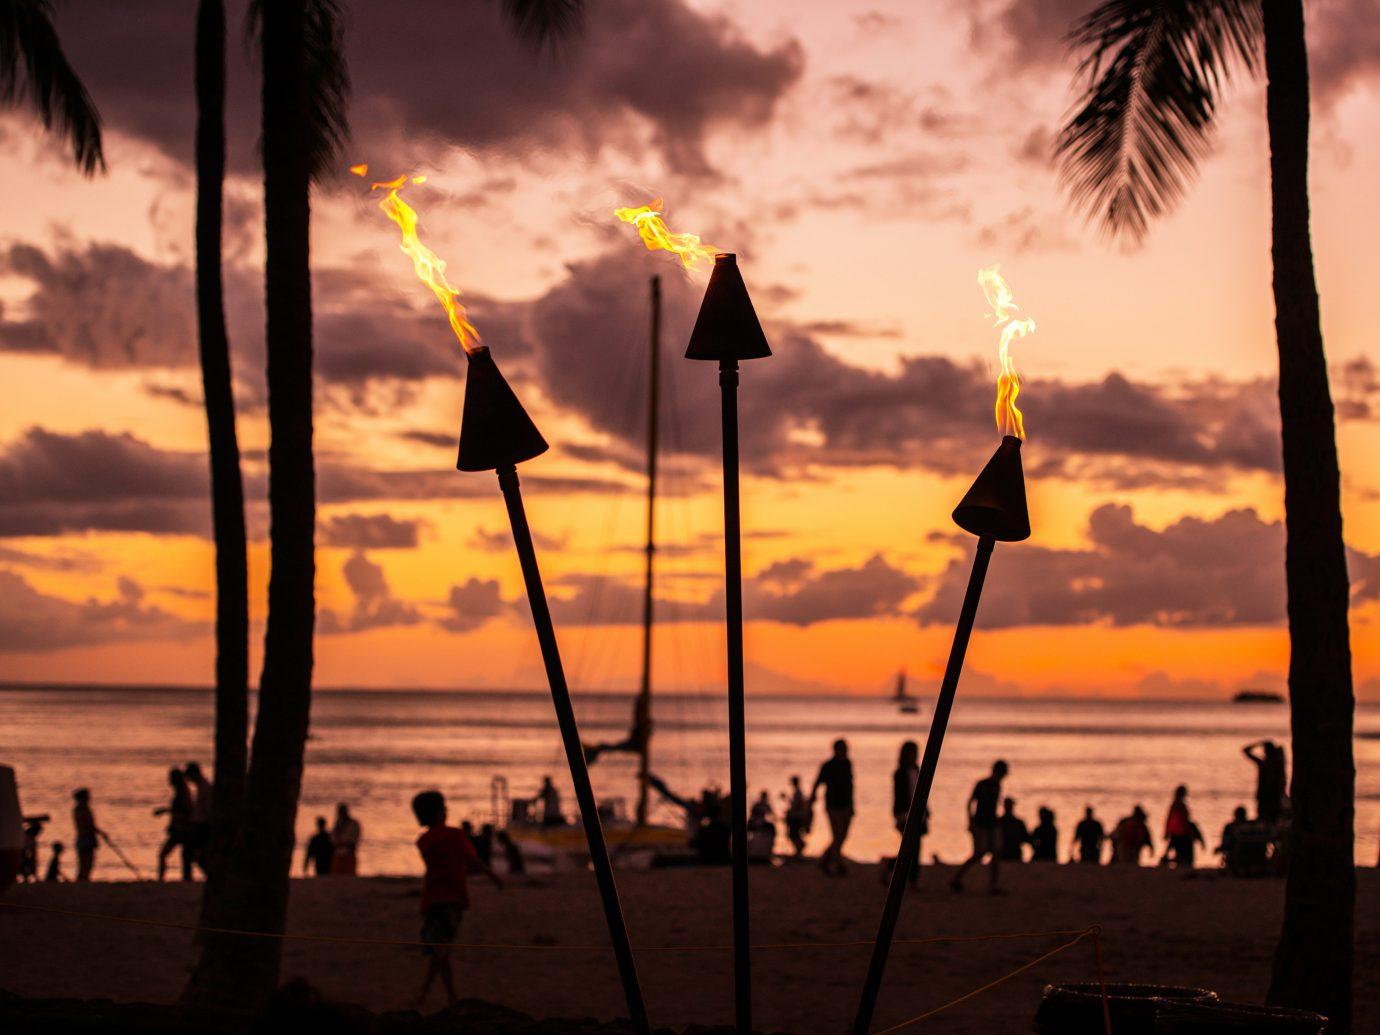 Beach Jetsetter Guides Ocean Scenic views Sunset sky outdoor water cloud Sun evening dusk morning afterglow dawn sunlight sunrise Sea silhouette tree setting clouds sailing vessel shore sandy